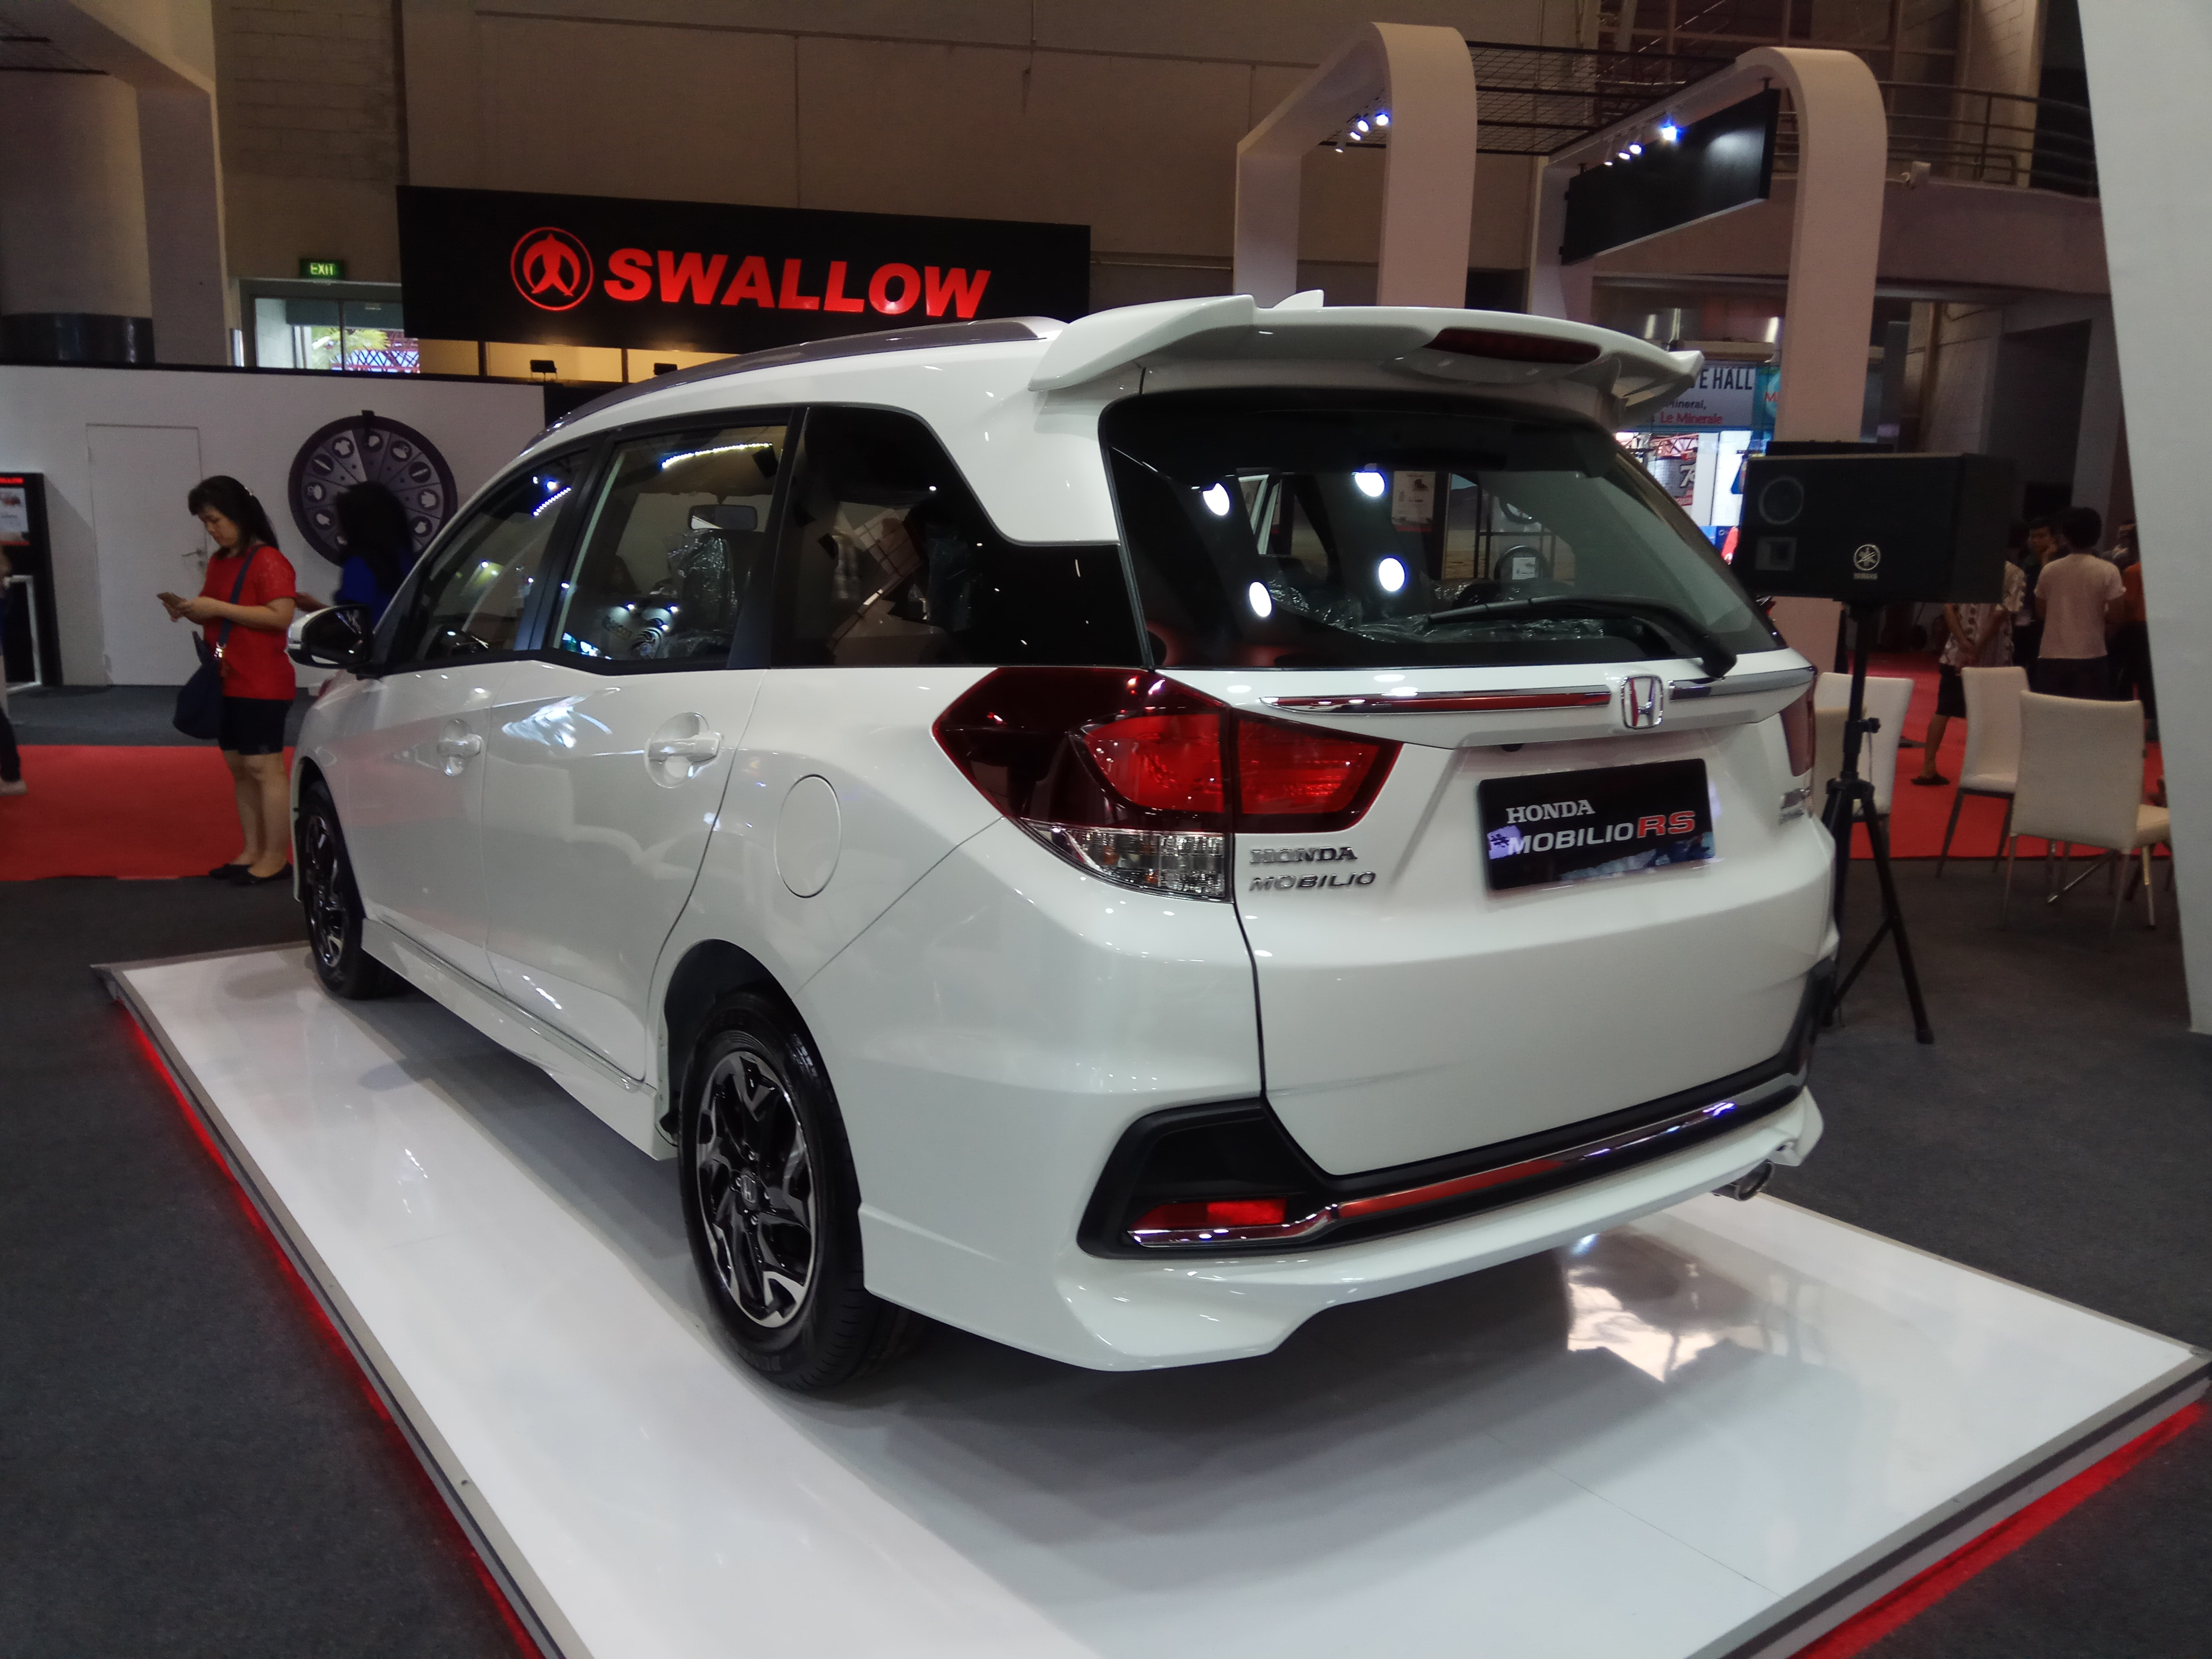 Kelebihan Kekurangan Honda Mobilio 2019 Tangguh